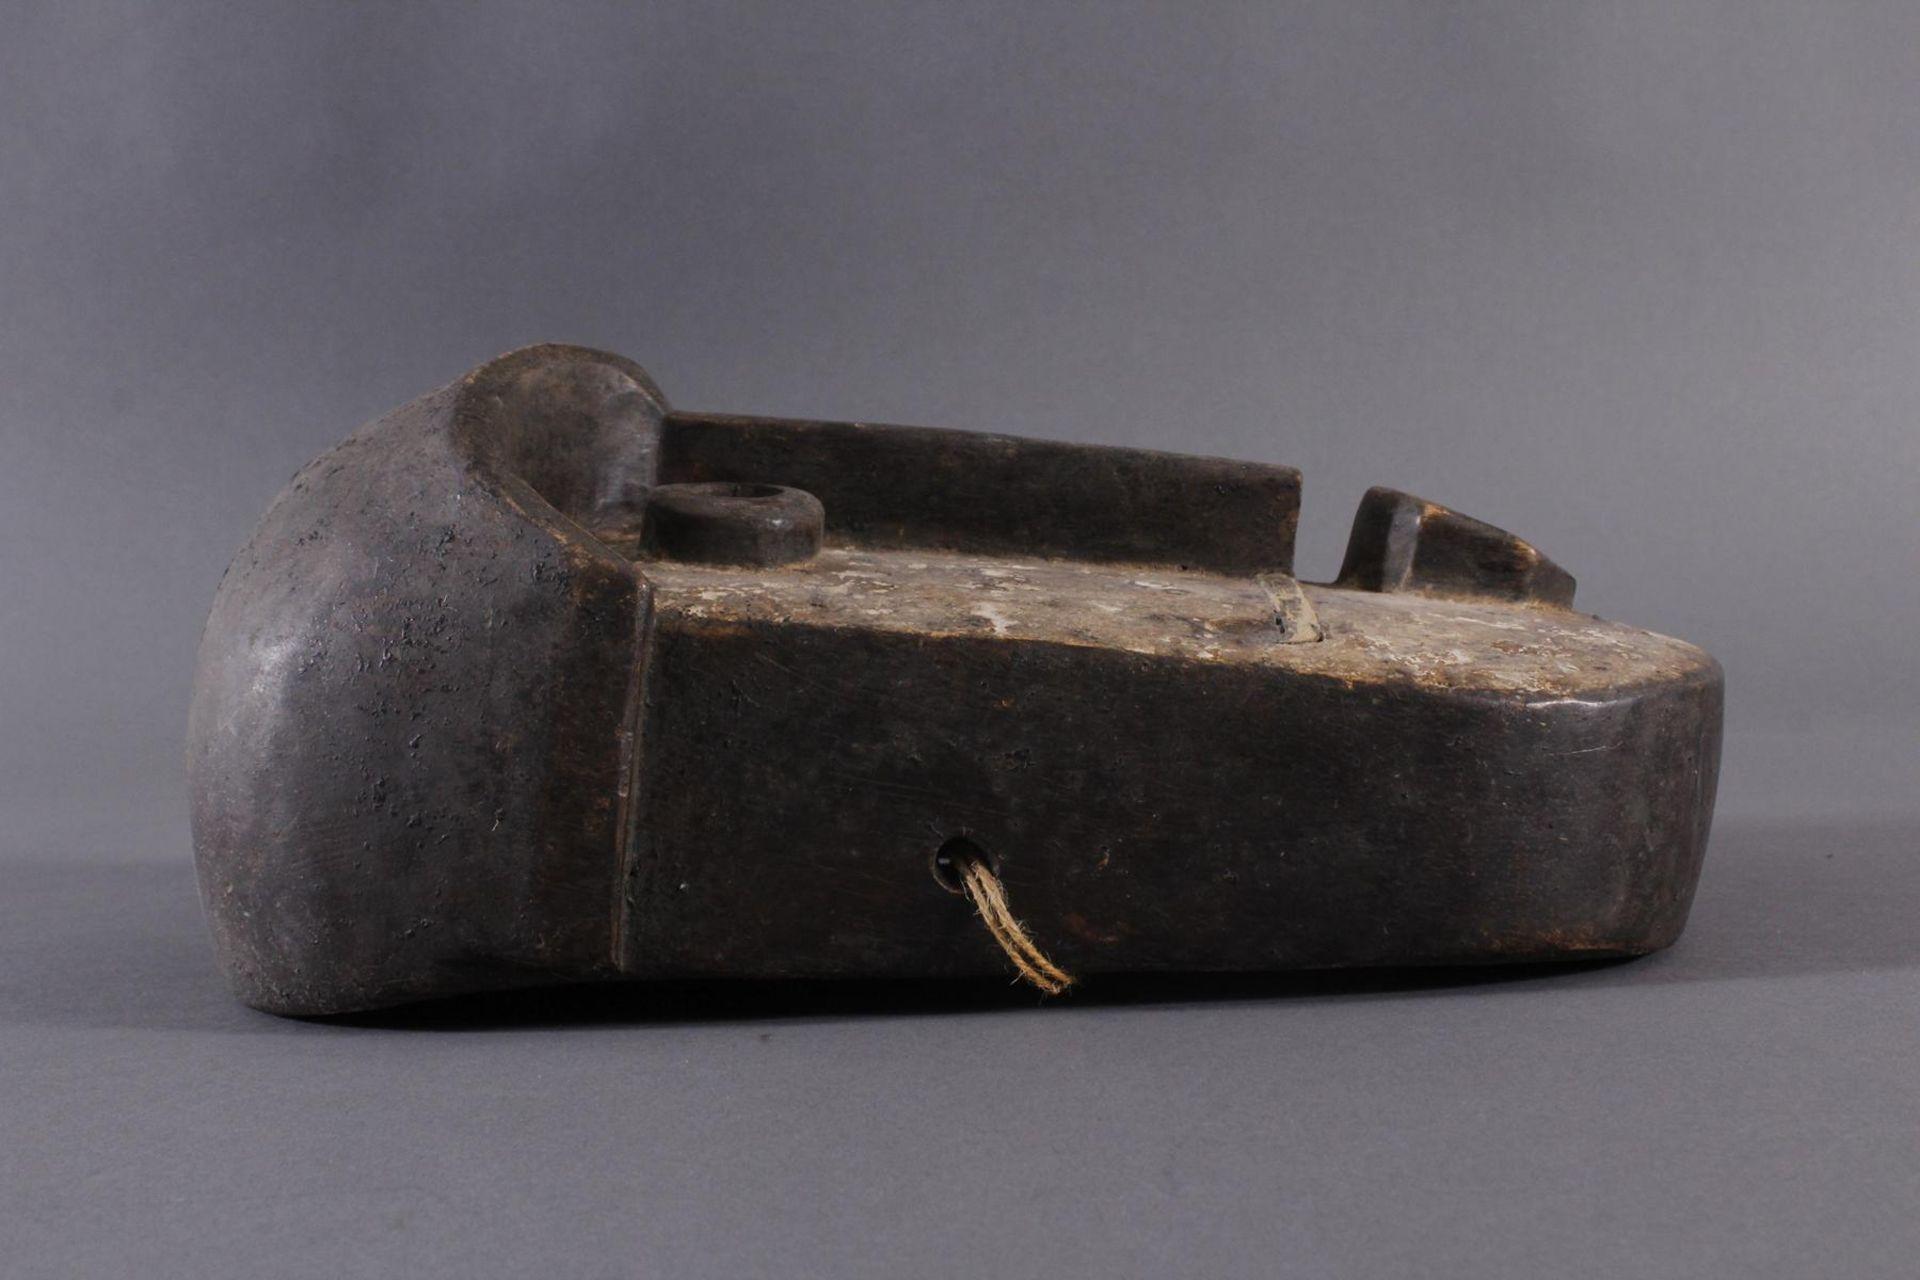 Antike Maske, Bembe, Kongo 1. Hälfte 20. Jh.Holz geschnitzt, runde Augen, dunkelbraune Patina, Reste - Bild 3 aus 6